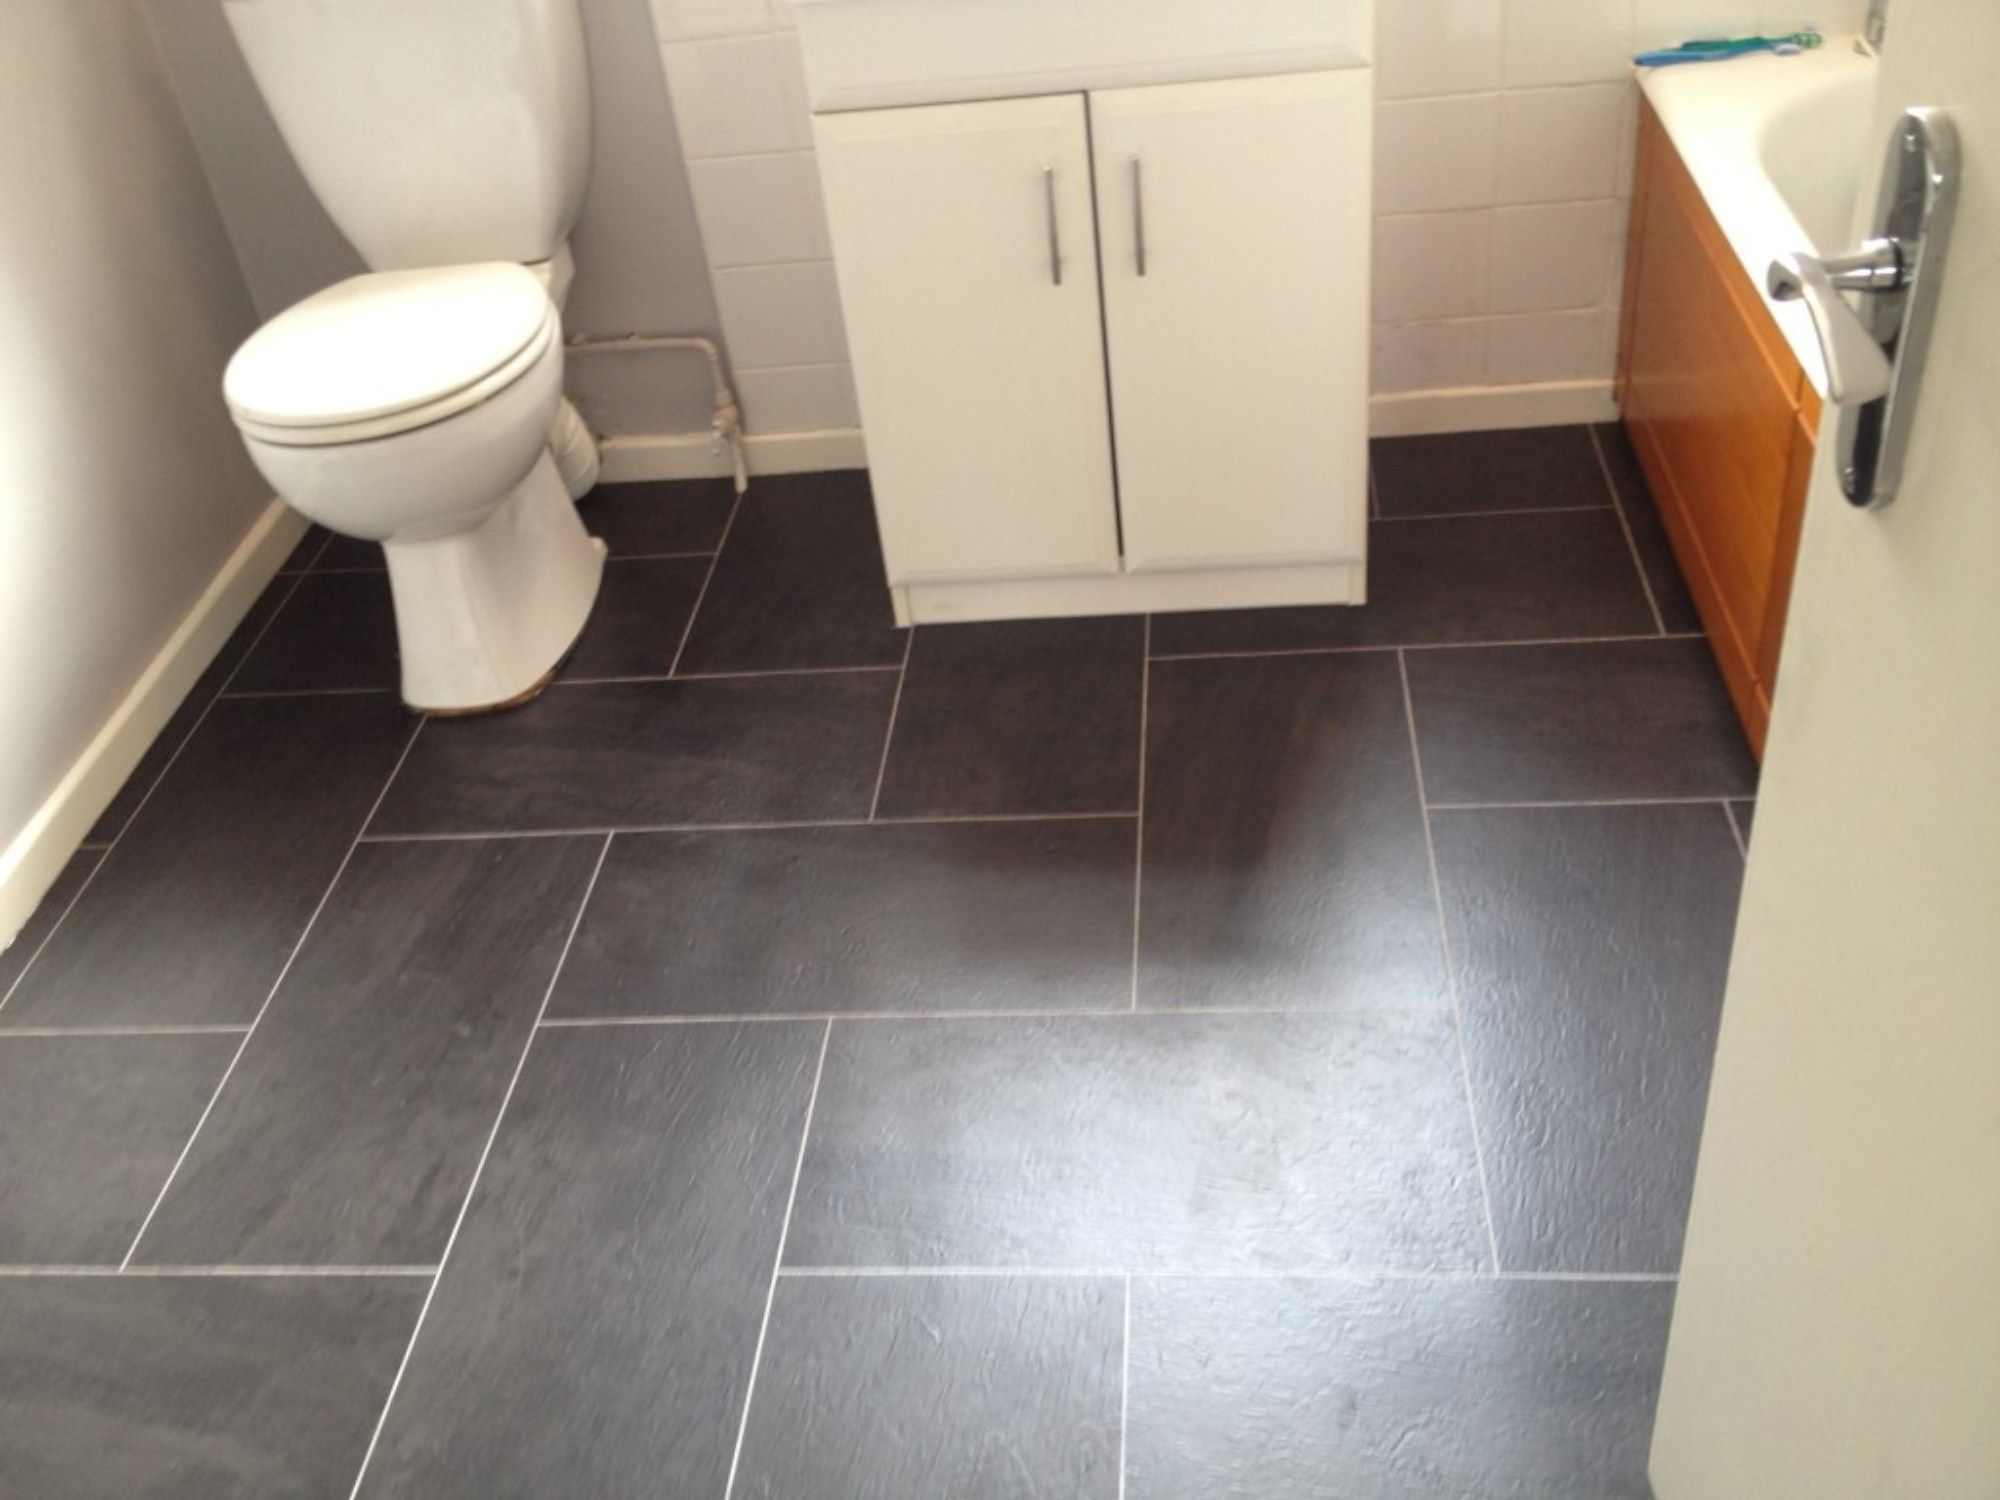 White quartz bathroom floor tiles bathroom exclusiv pinterest white quartz bathroom floor tiles dailygadgetfo Choice Image